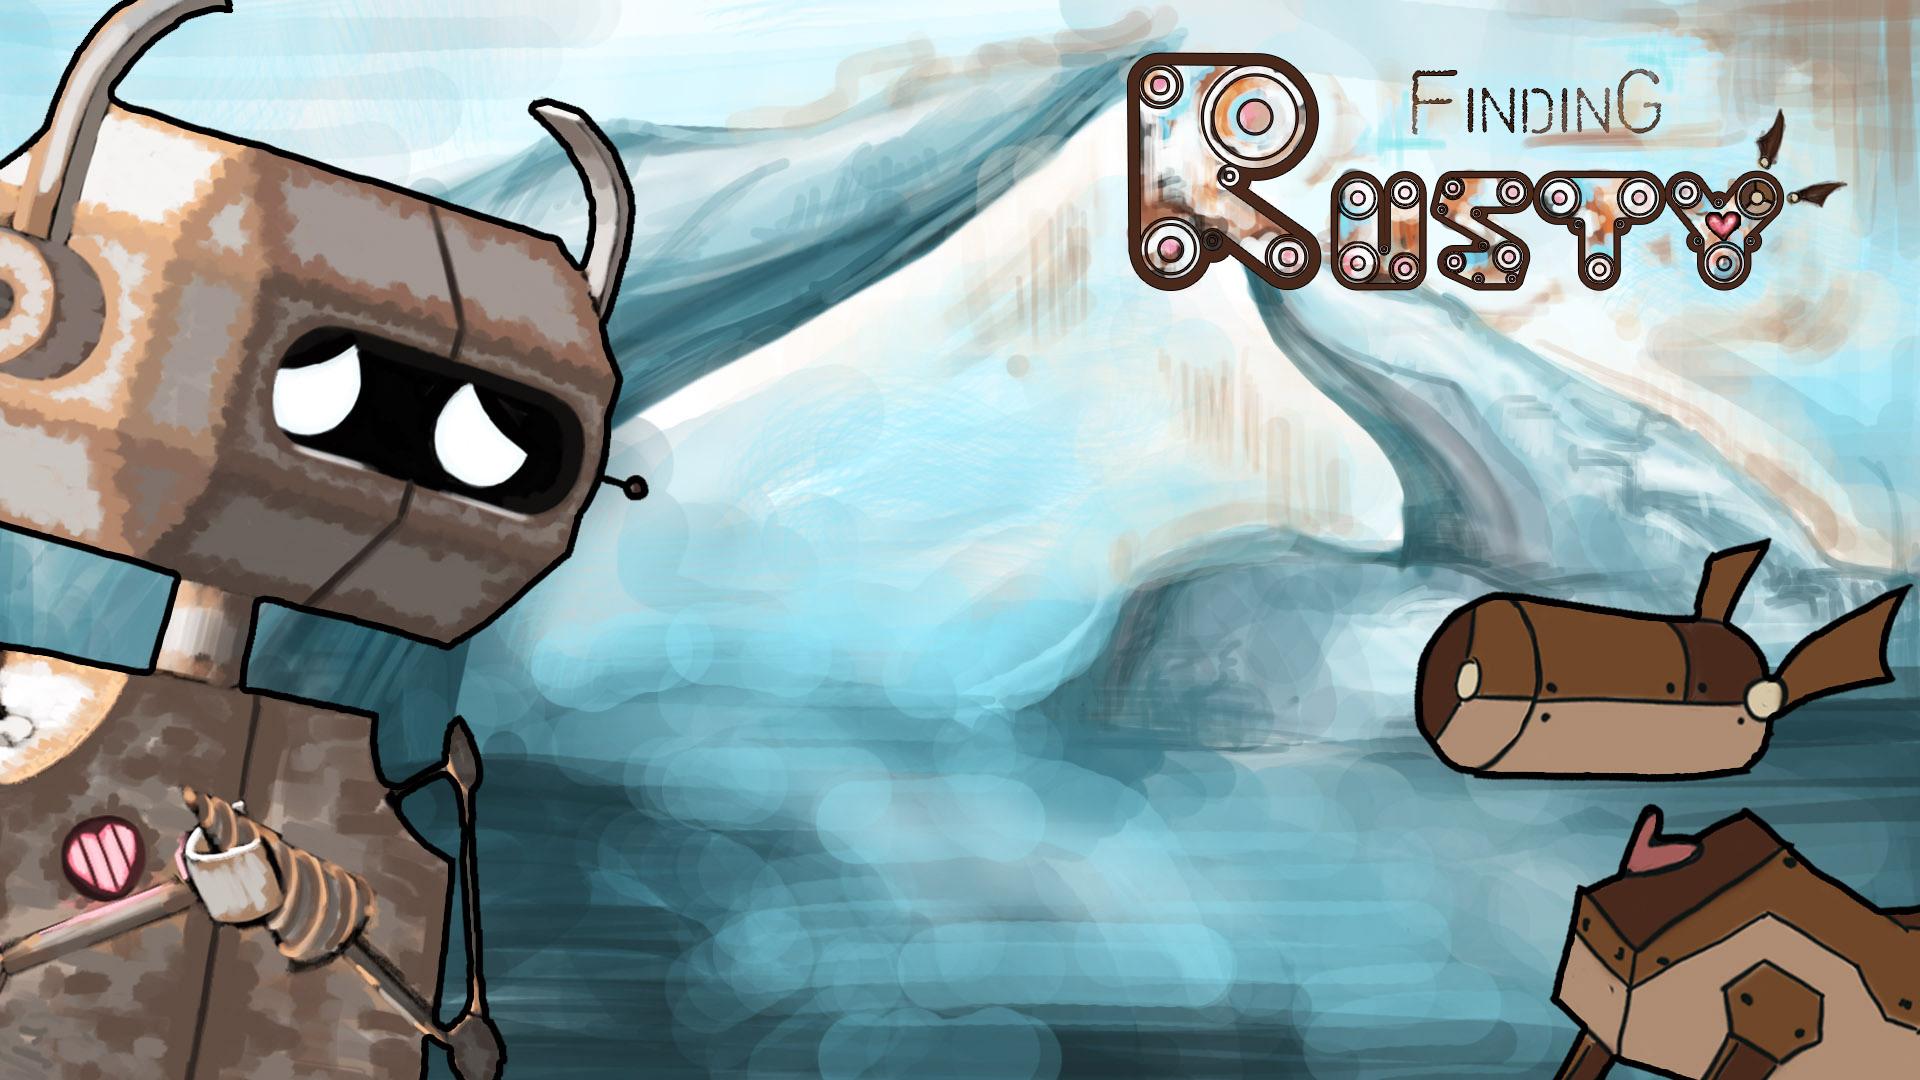 Finding Rusty